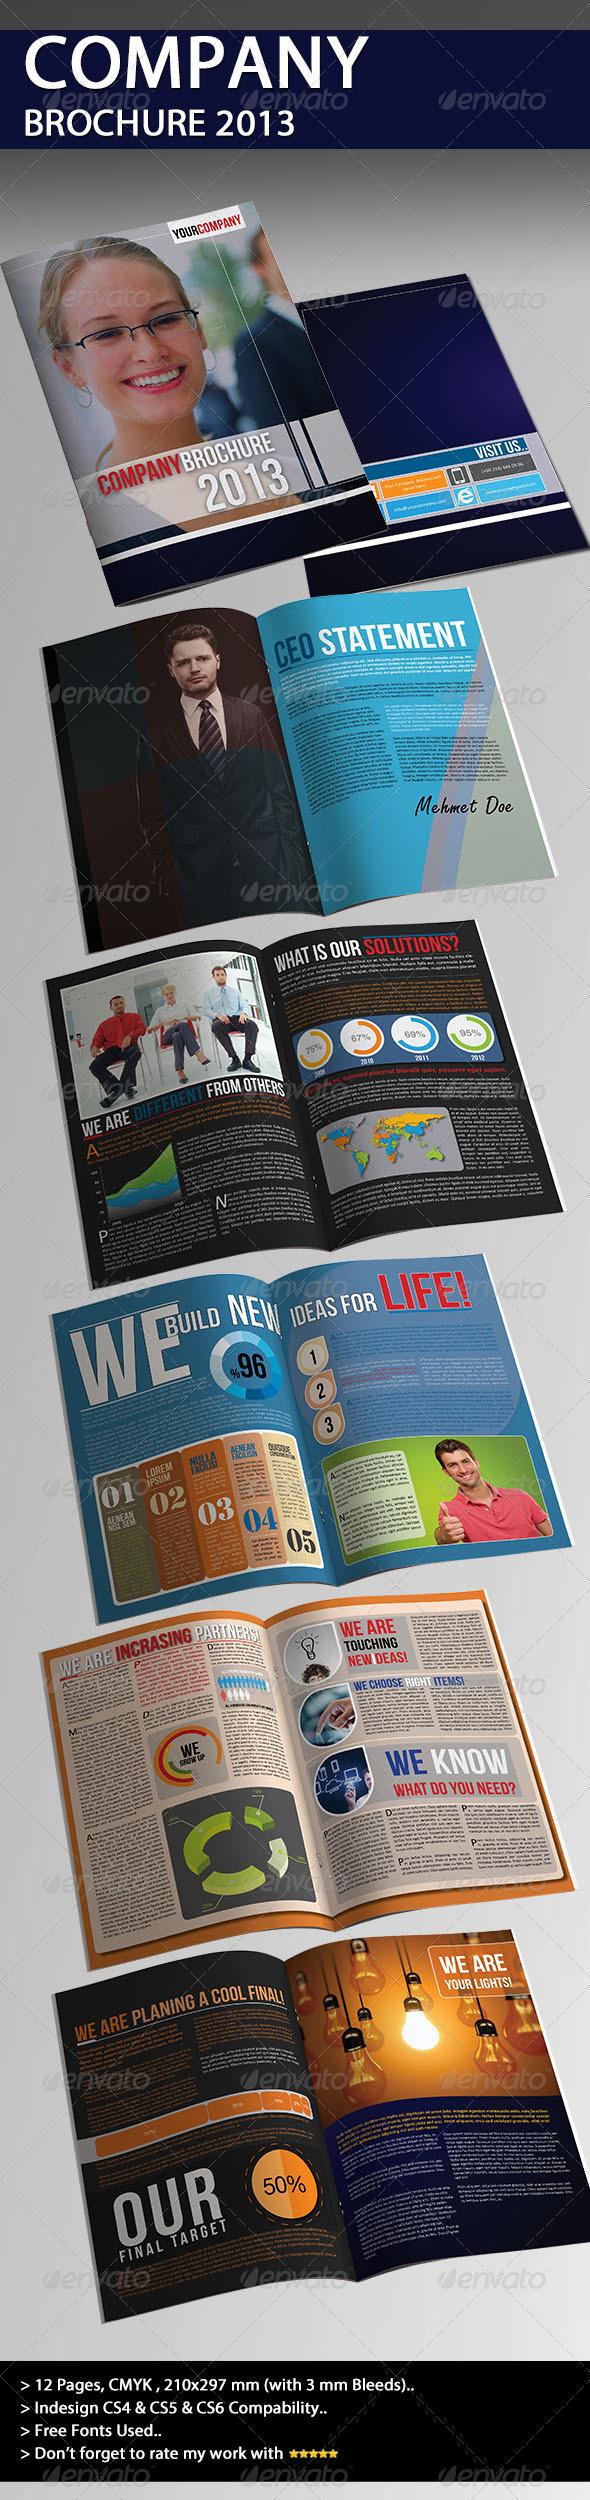 Company Brochure 2013 Part 02 - Corporate Brochures